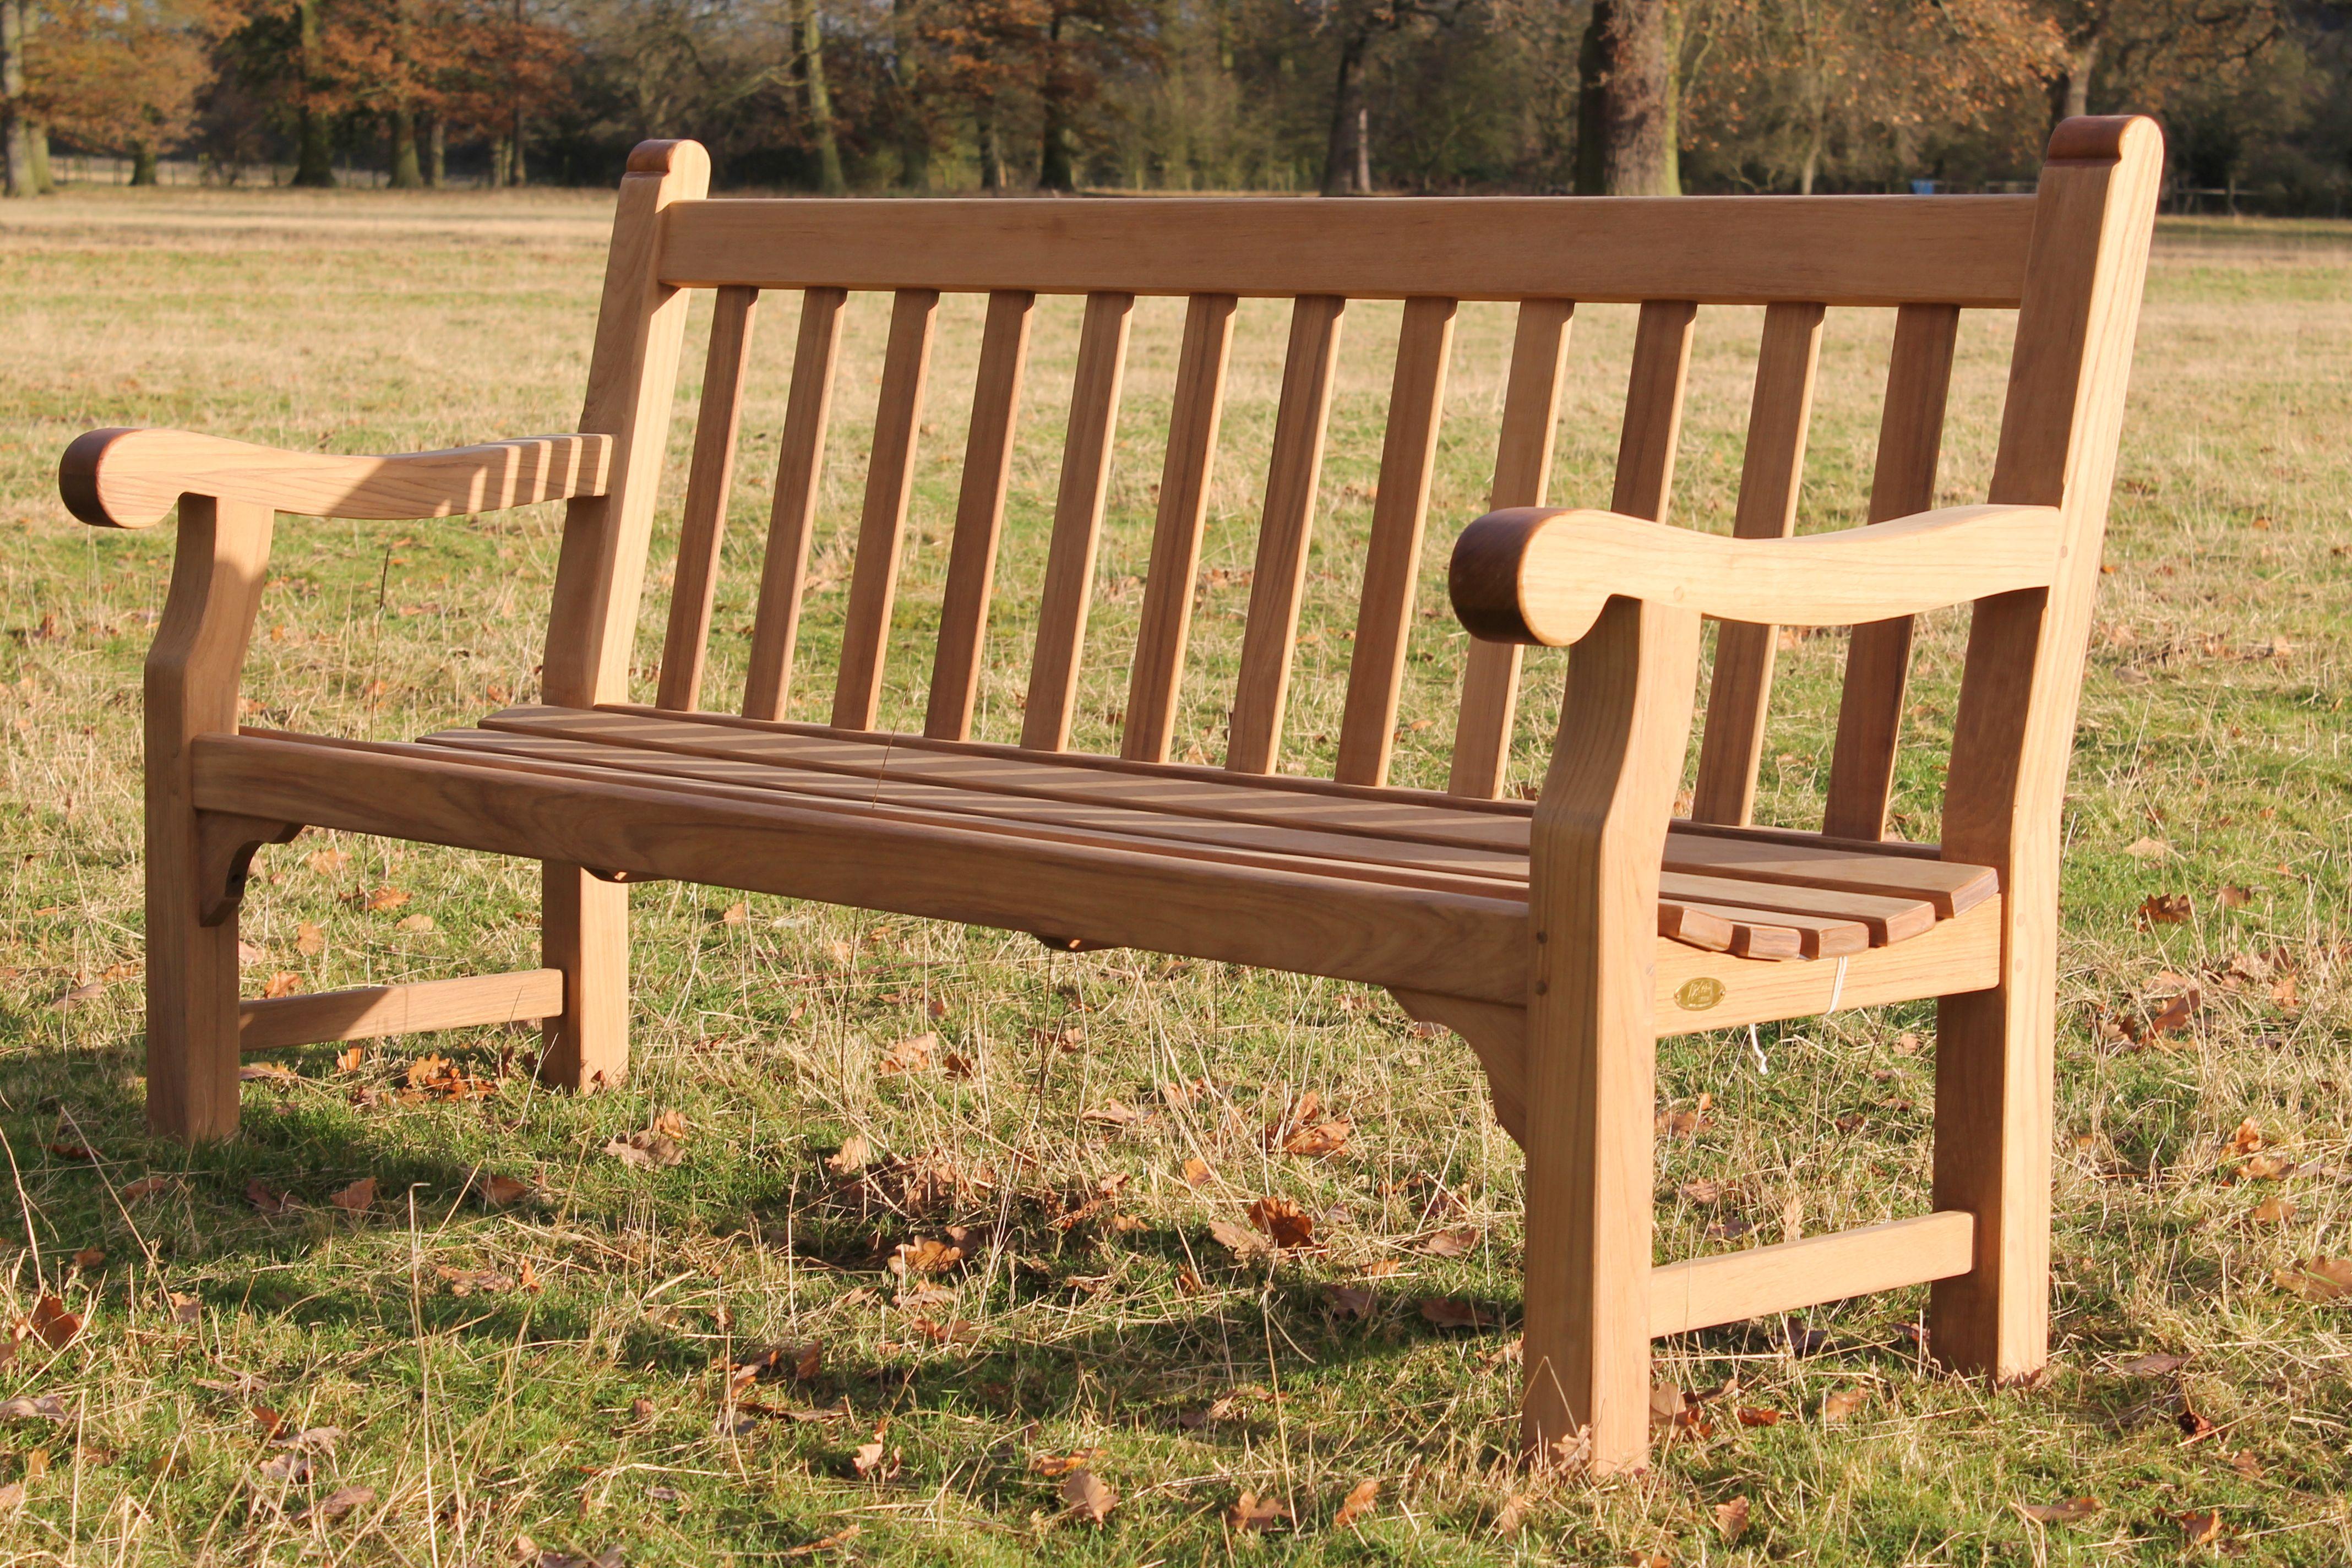 Lister Mendip Bench Lister have been making quality hardwood